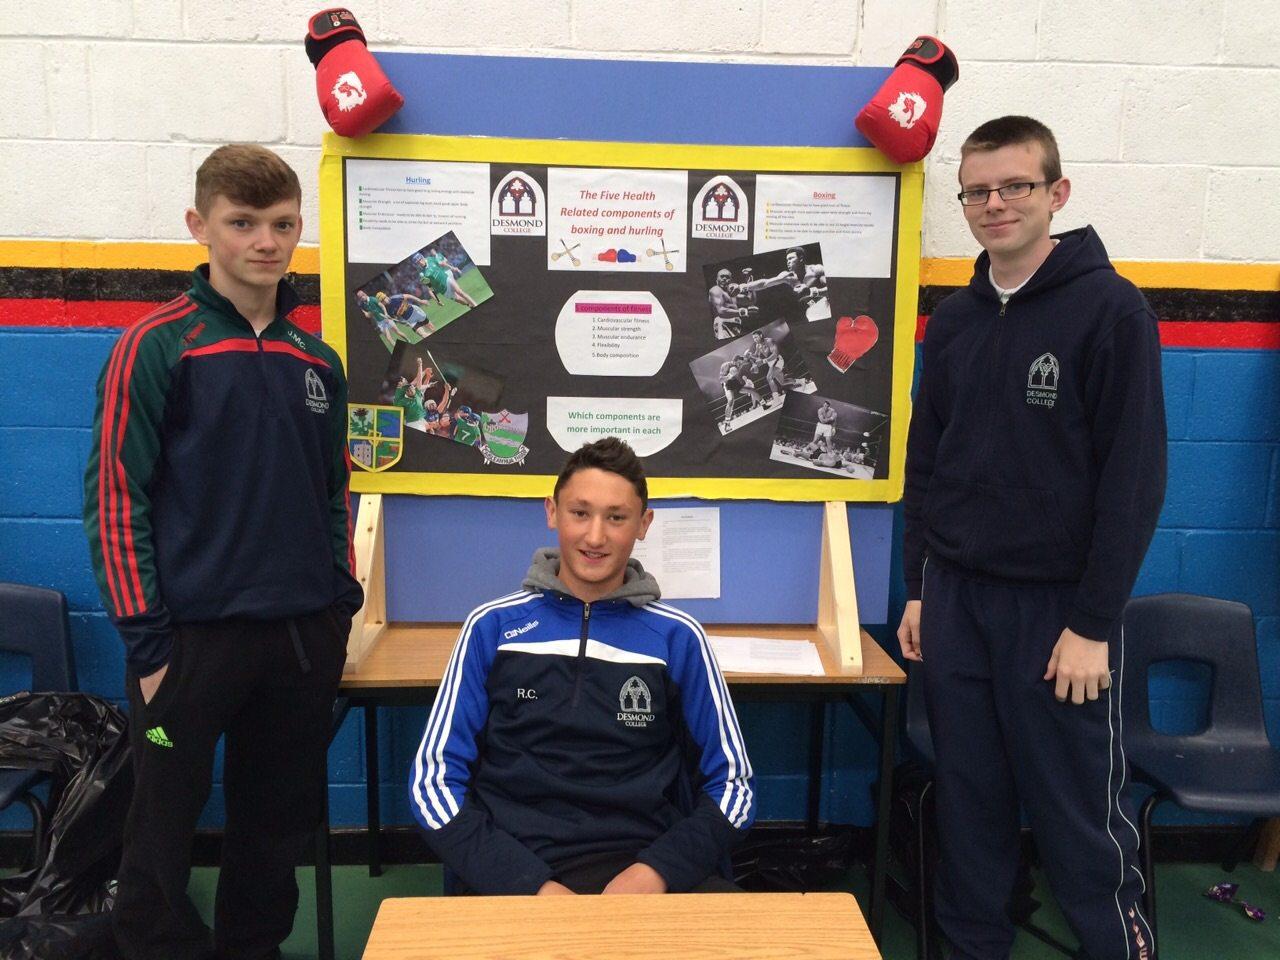 John McCoy, Roman Creedon and Conor Reidy present their project